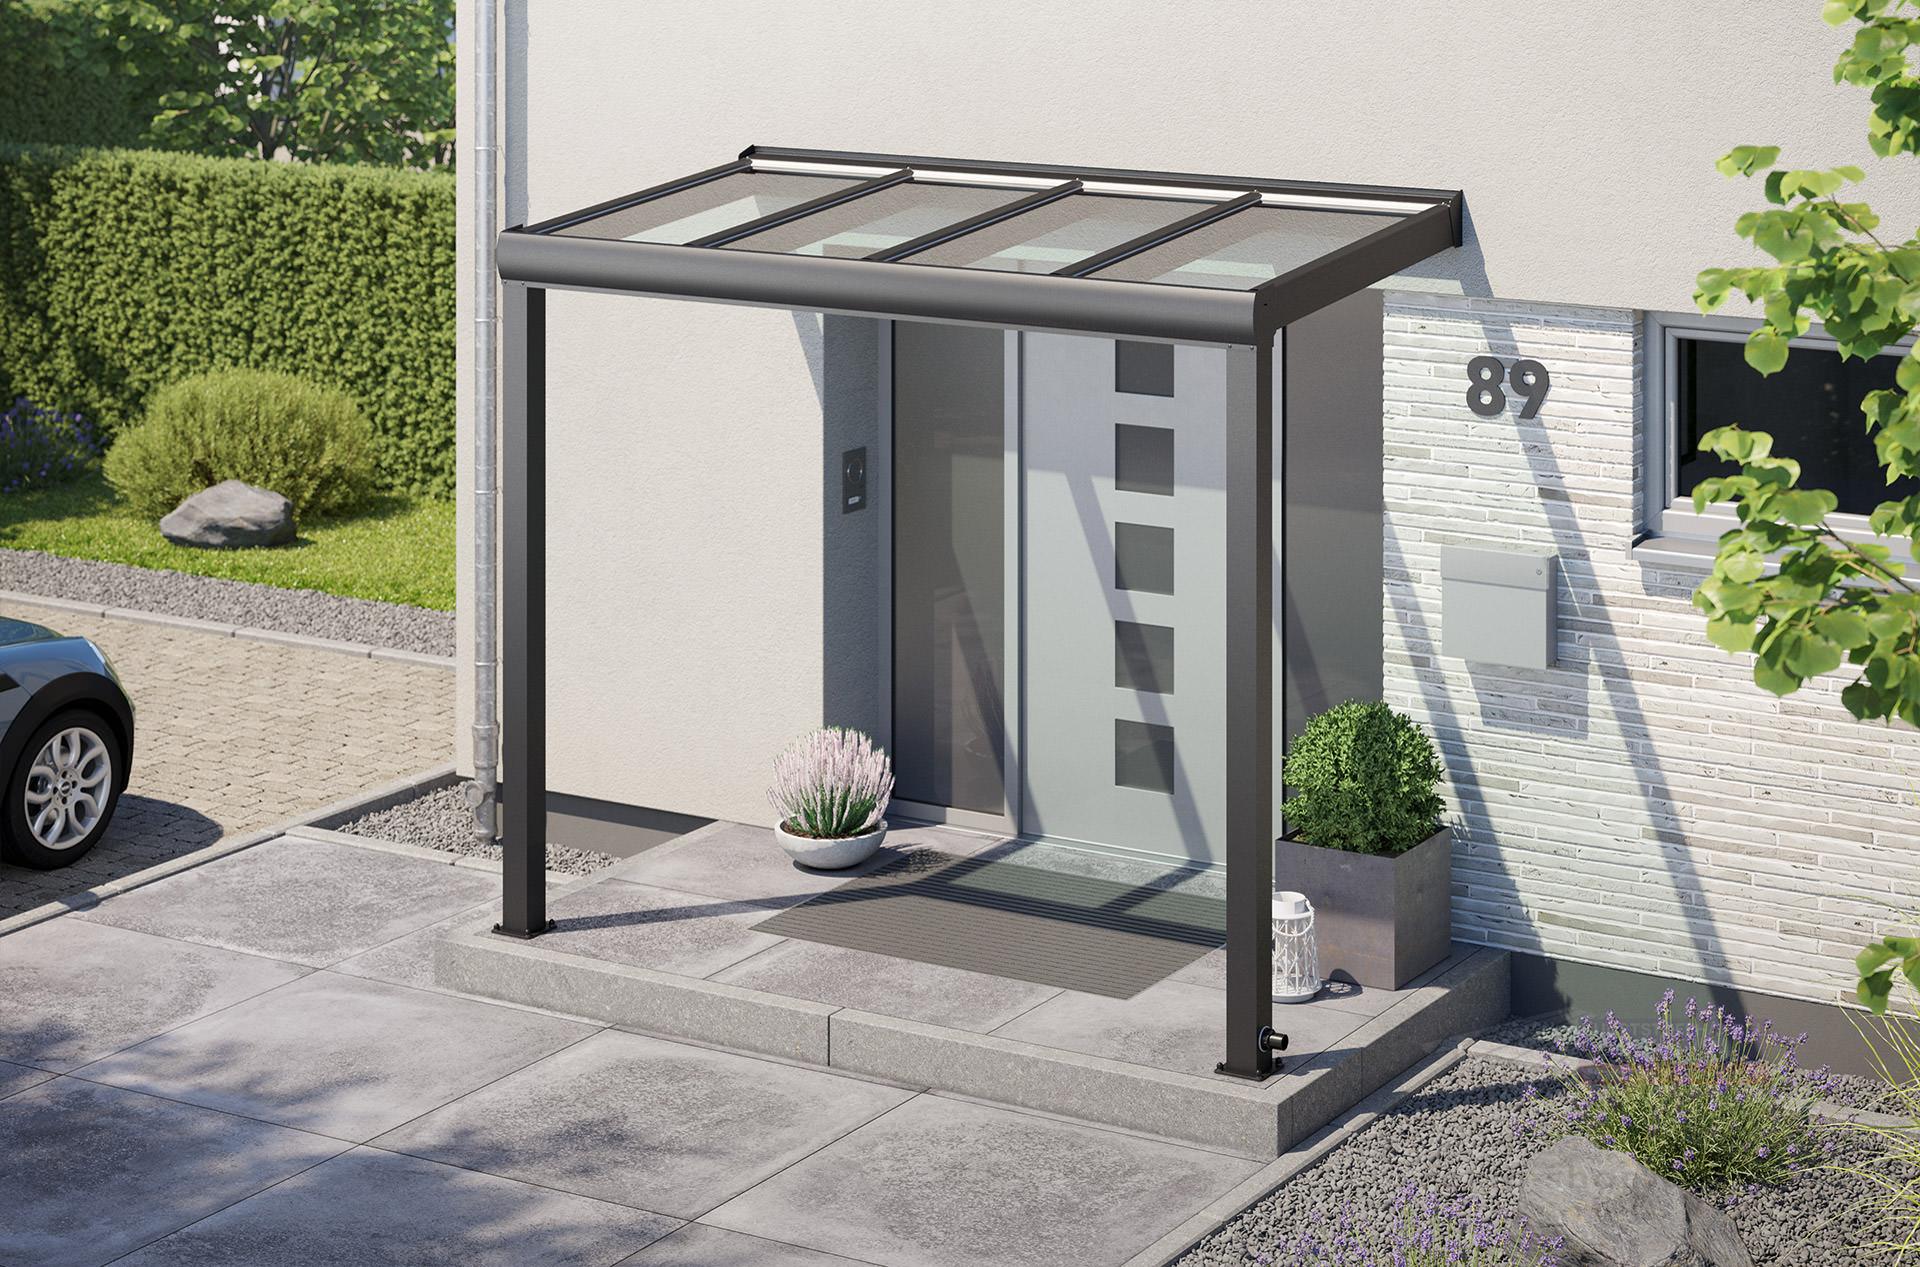 TERRAvita VSG Haustür Vordach 220,220 x 20,220m, VSG Glas